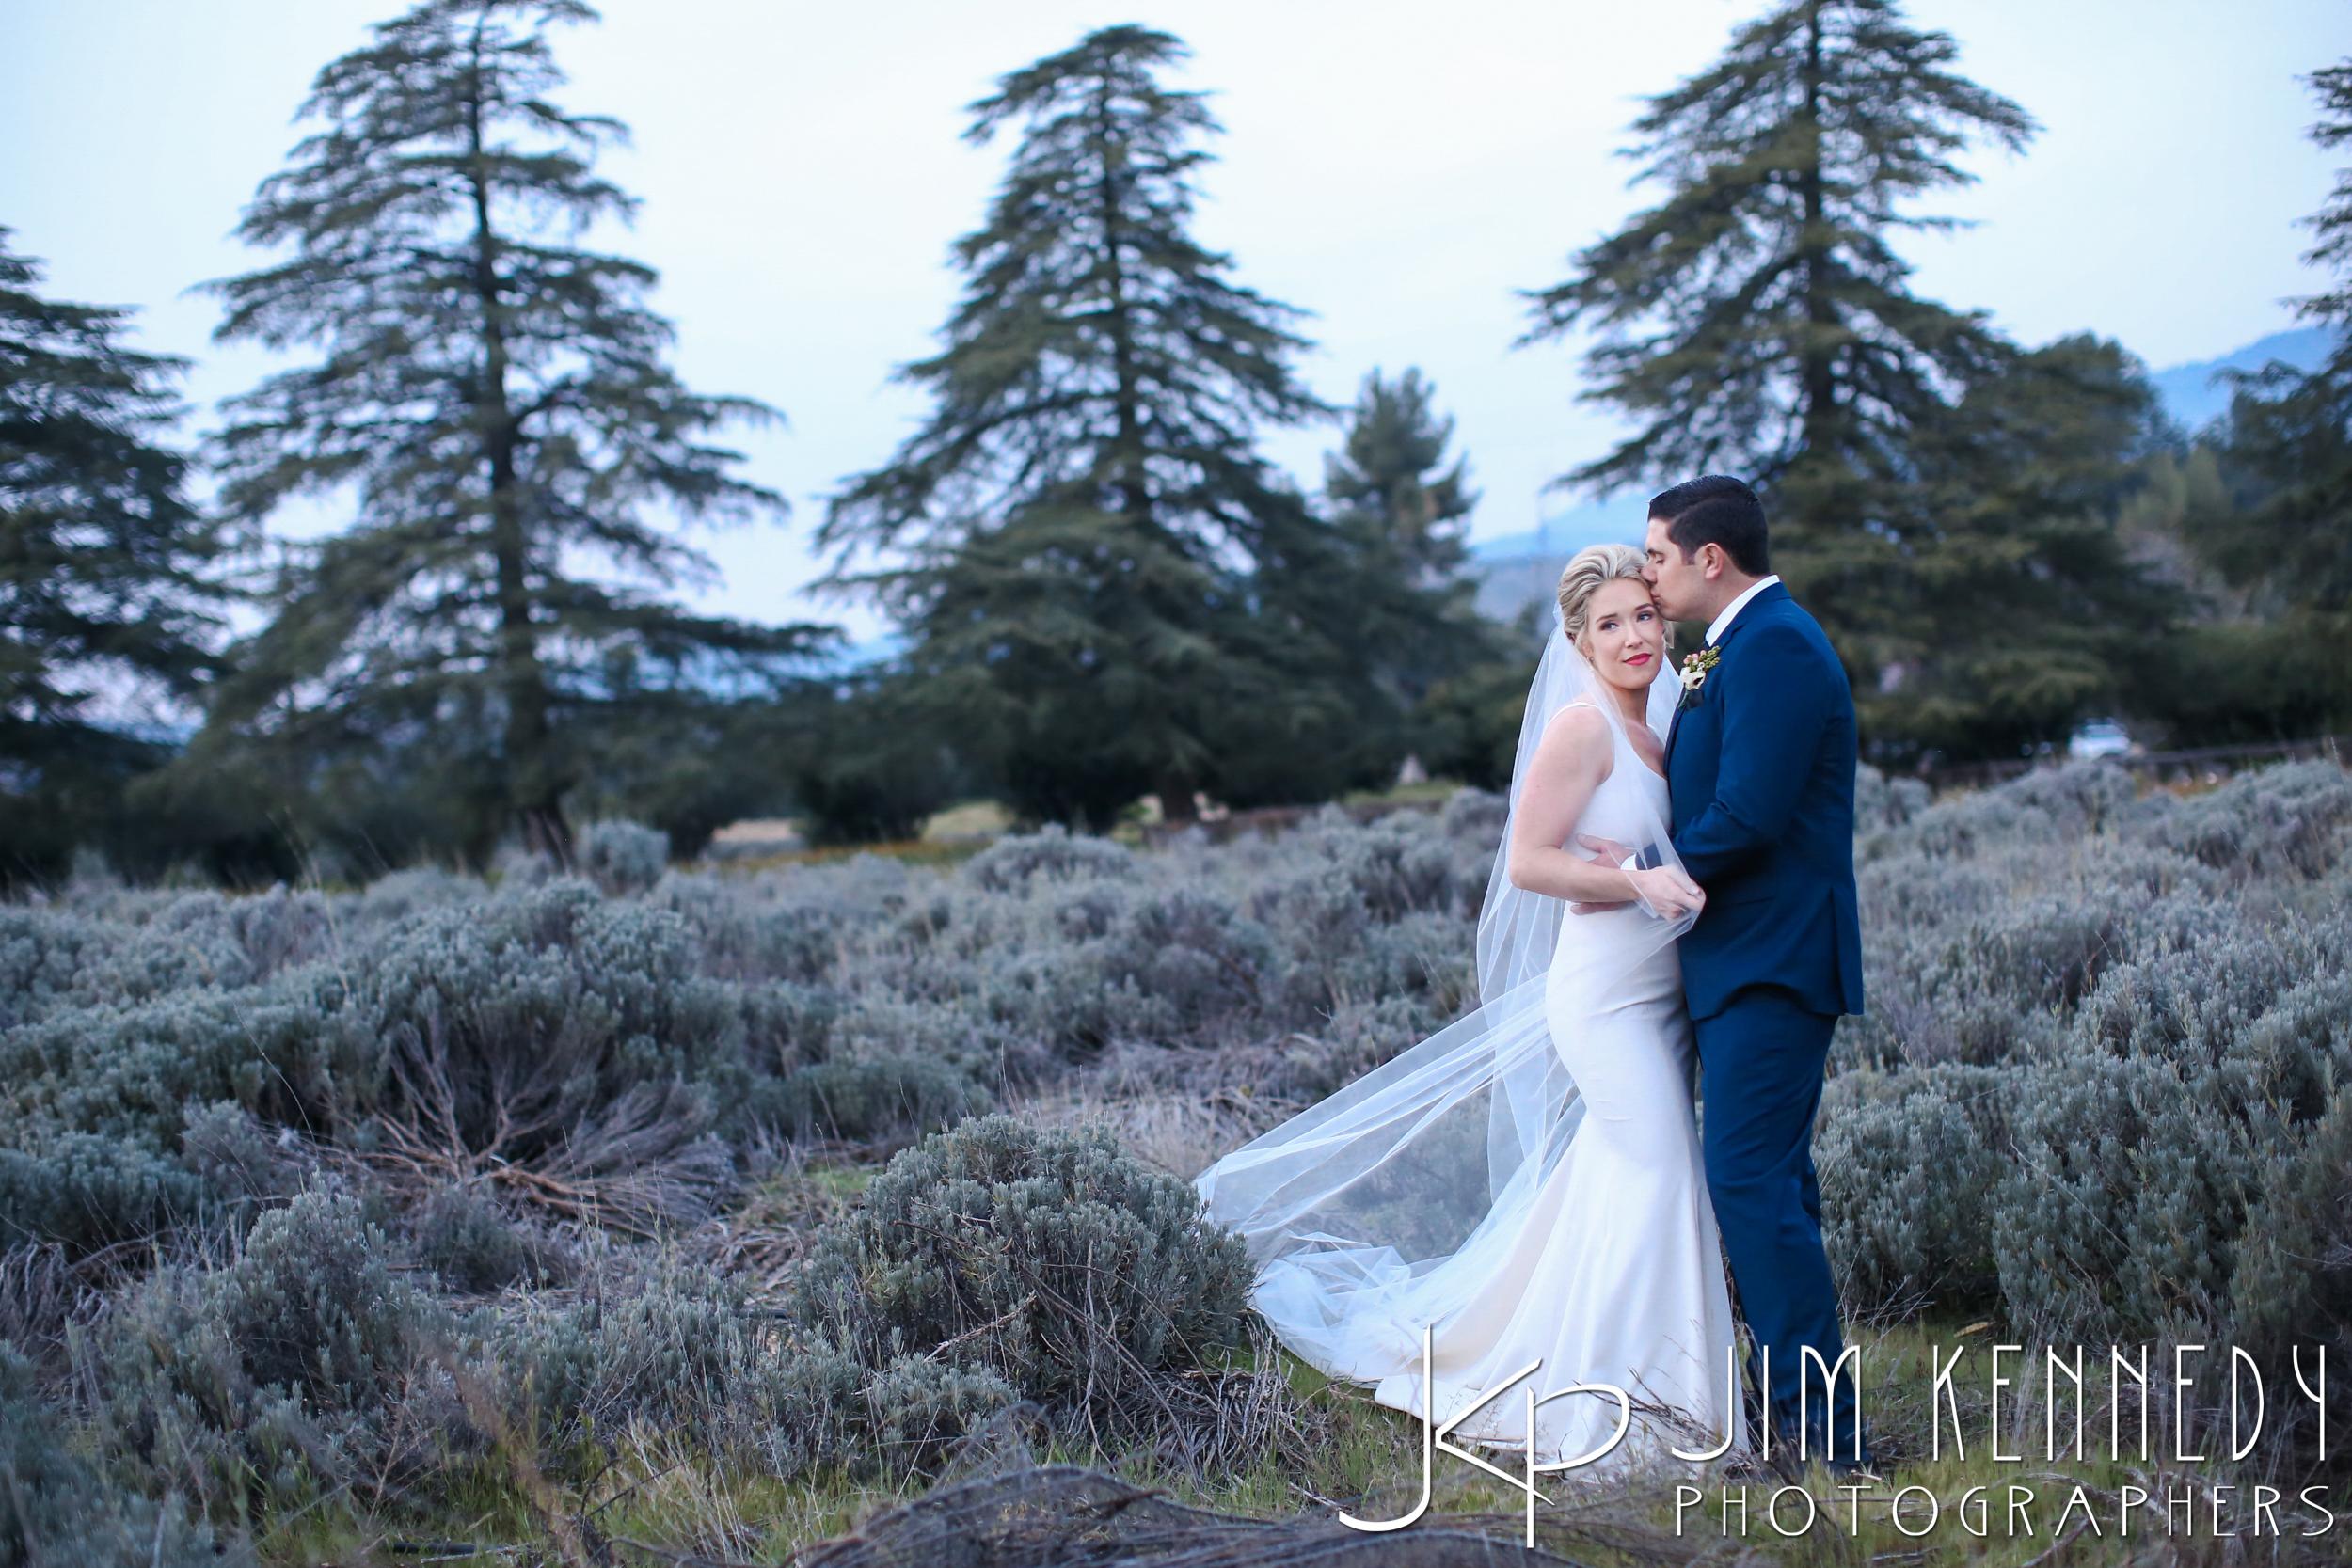 jim_kennedy_photographers_highland_springs_wedding_caitlyn_0163.jpg